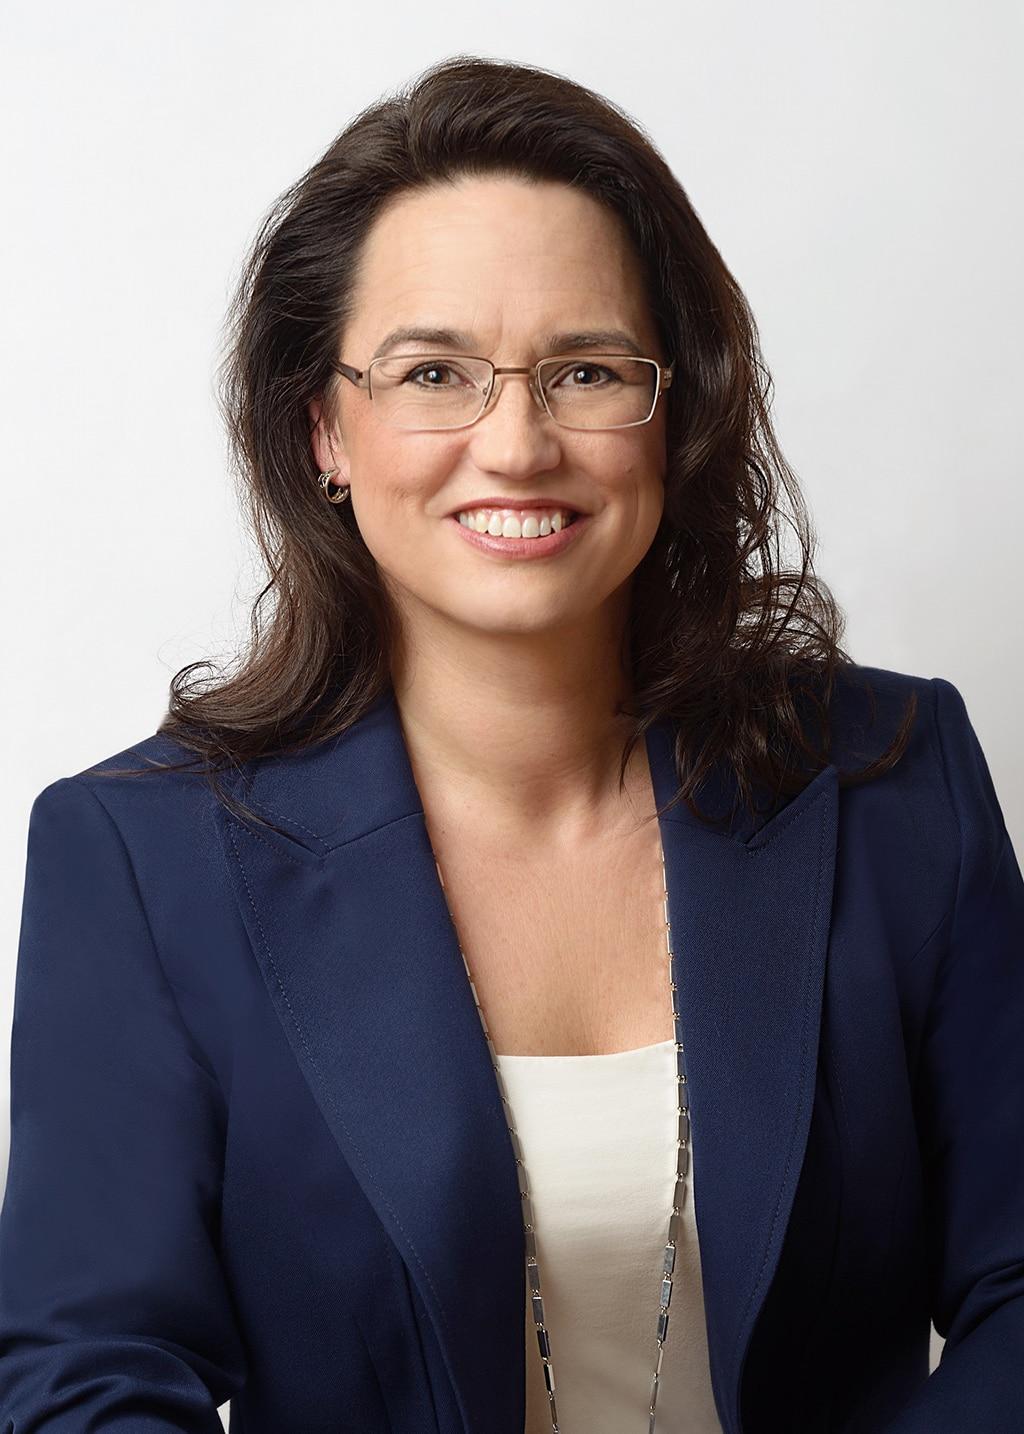 Diplom-Sozialwissenschaftlerin Alexandra Apenberg